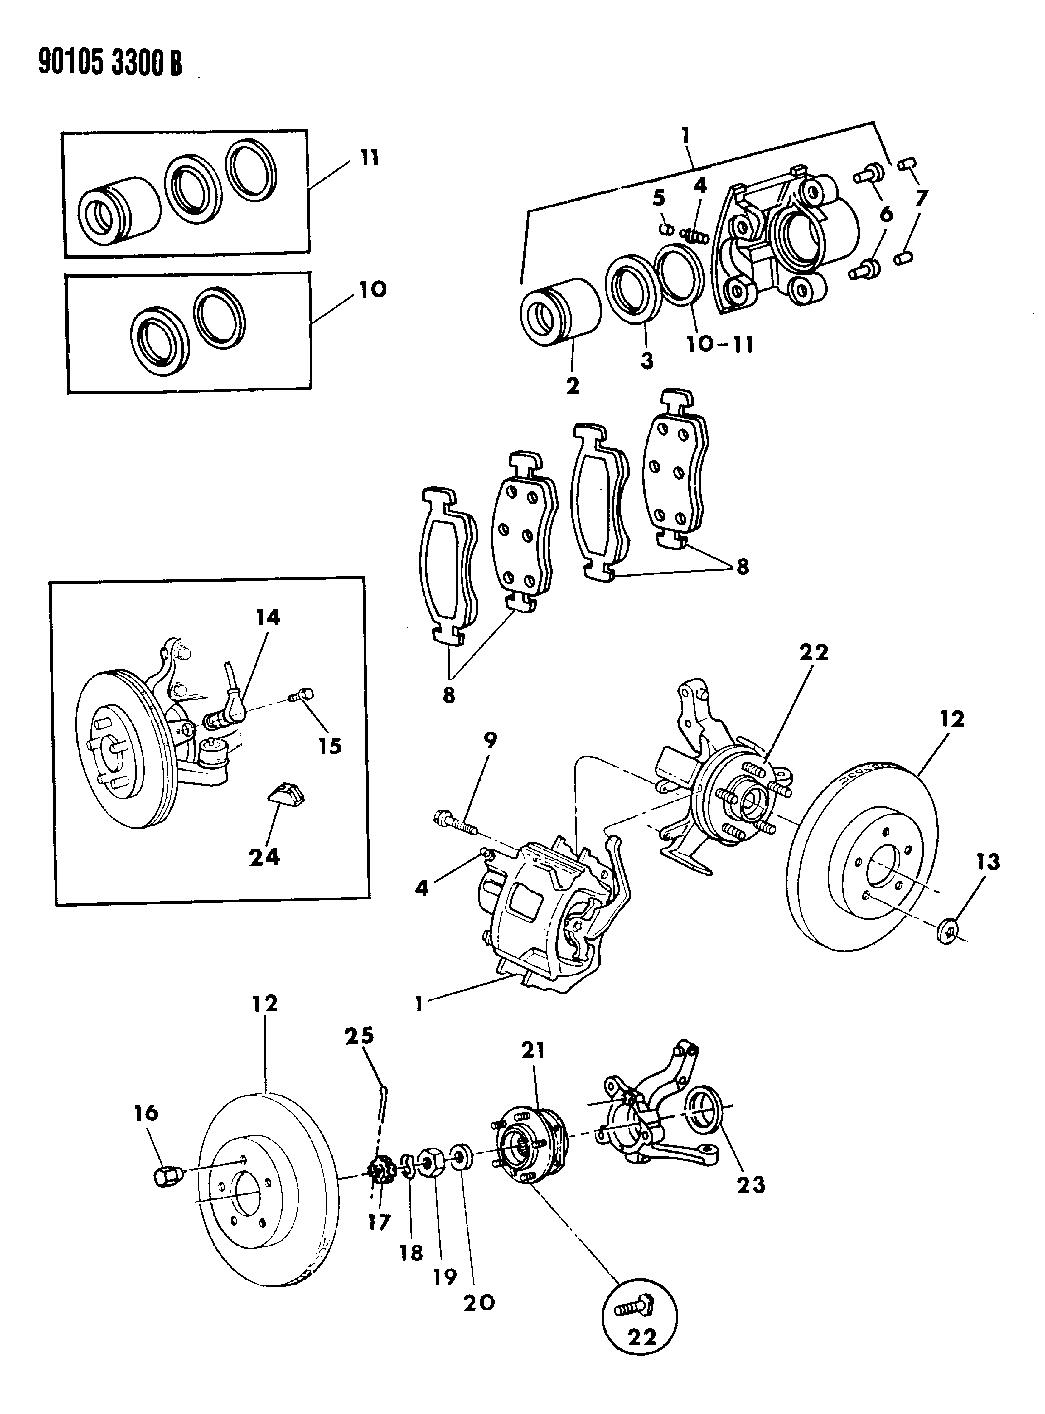 1991 Honda Crx Fuse Box Diagram In Addition Honda S2000 Push Start